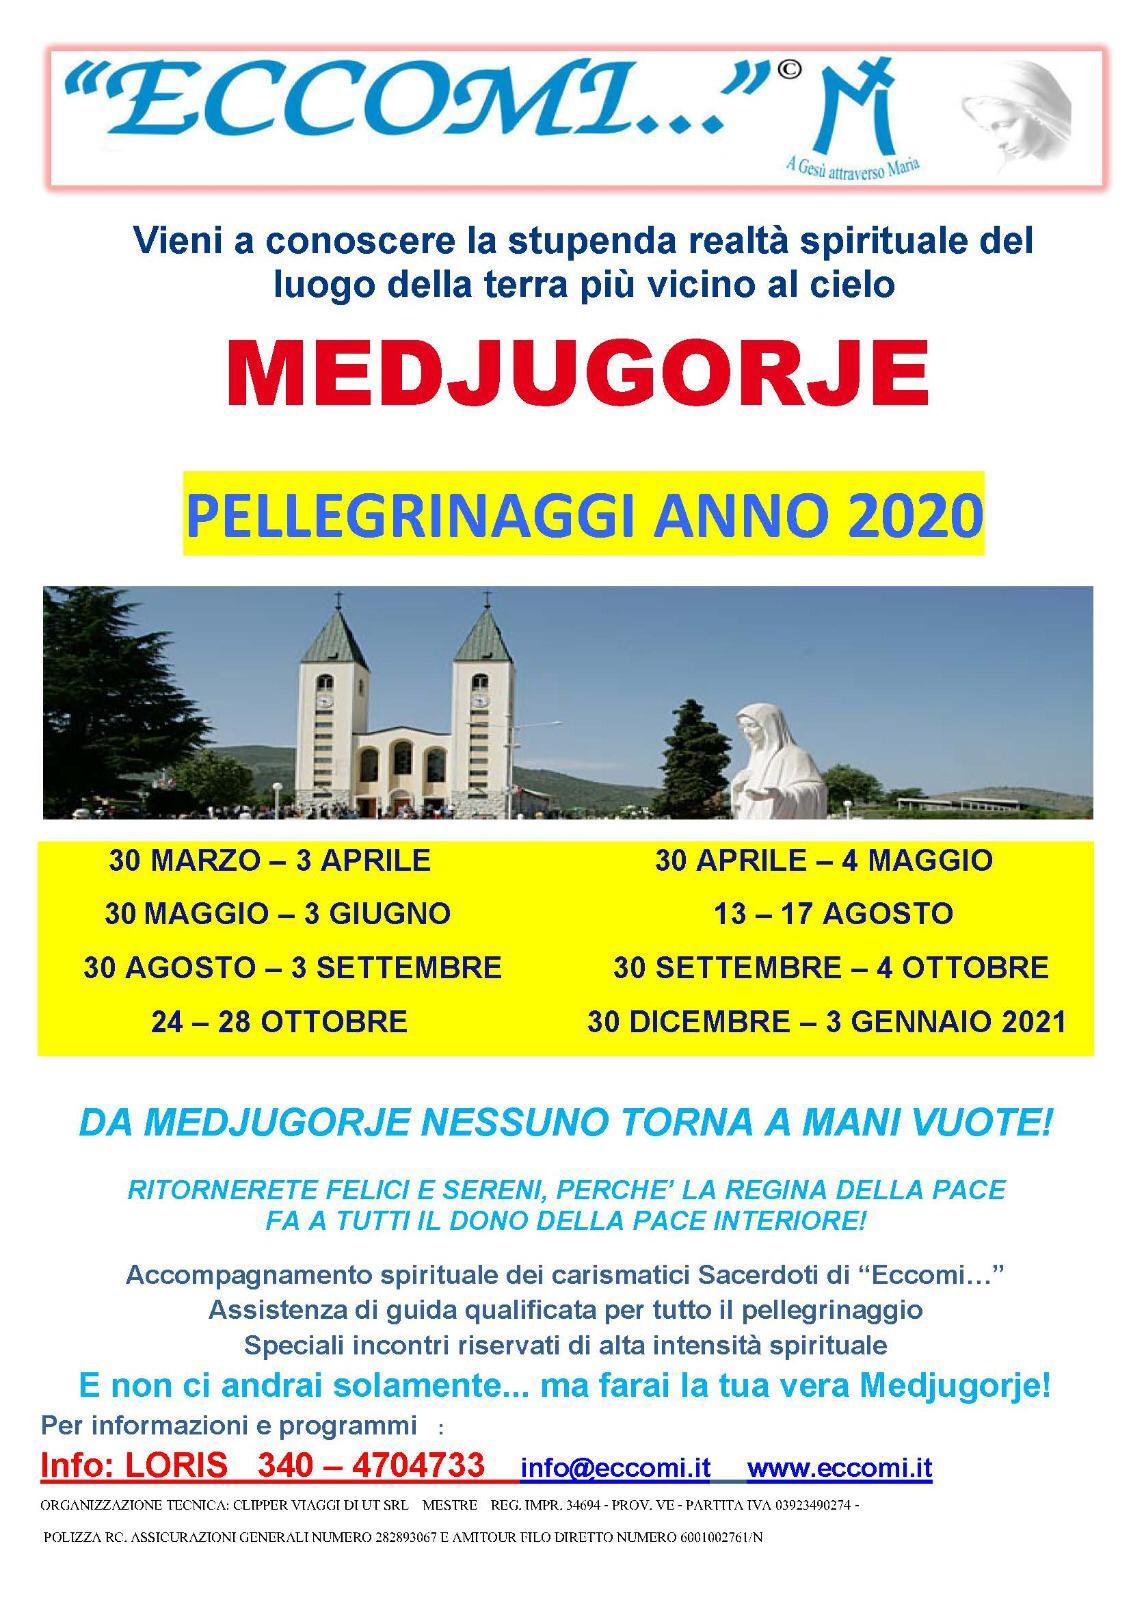 Pellegrinaggi Medjugorje gruppo eccomi 2020